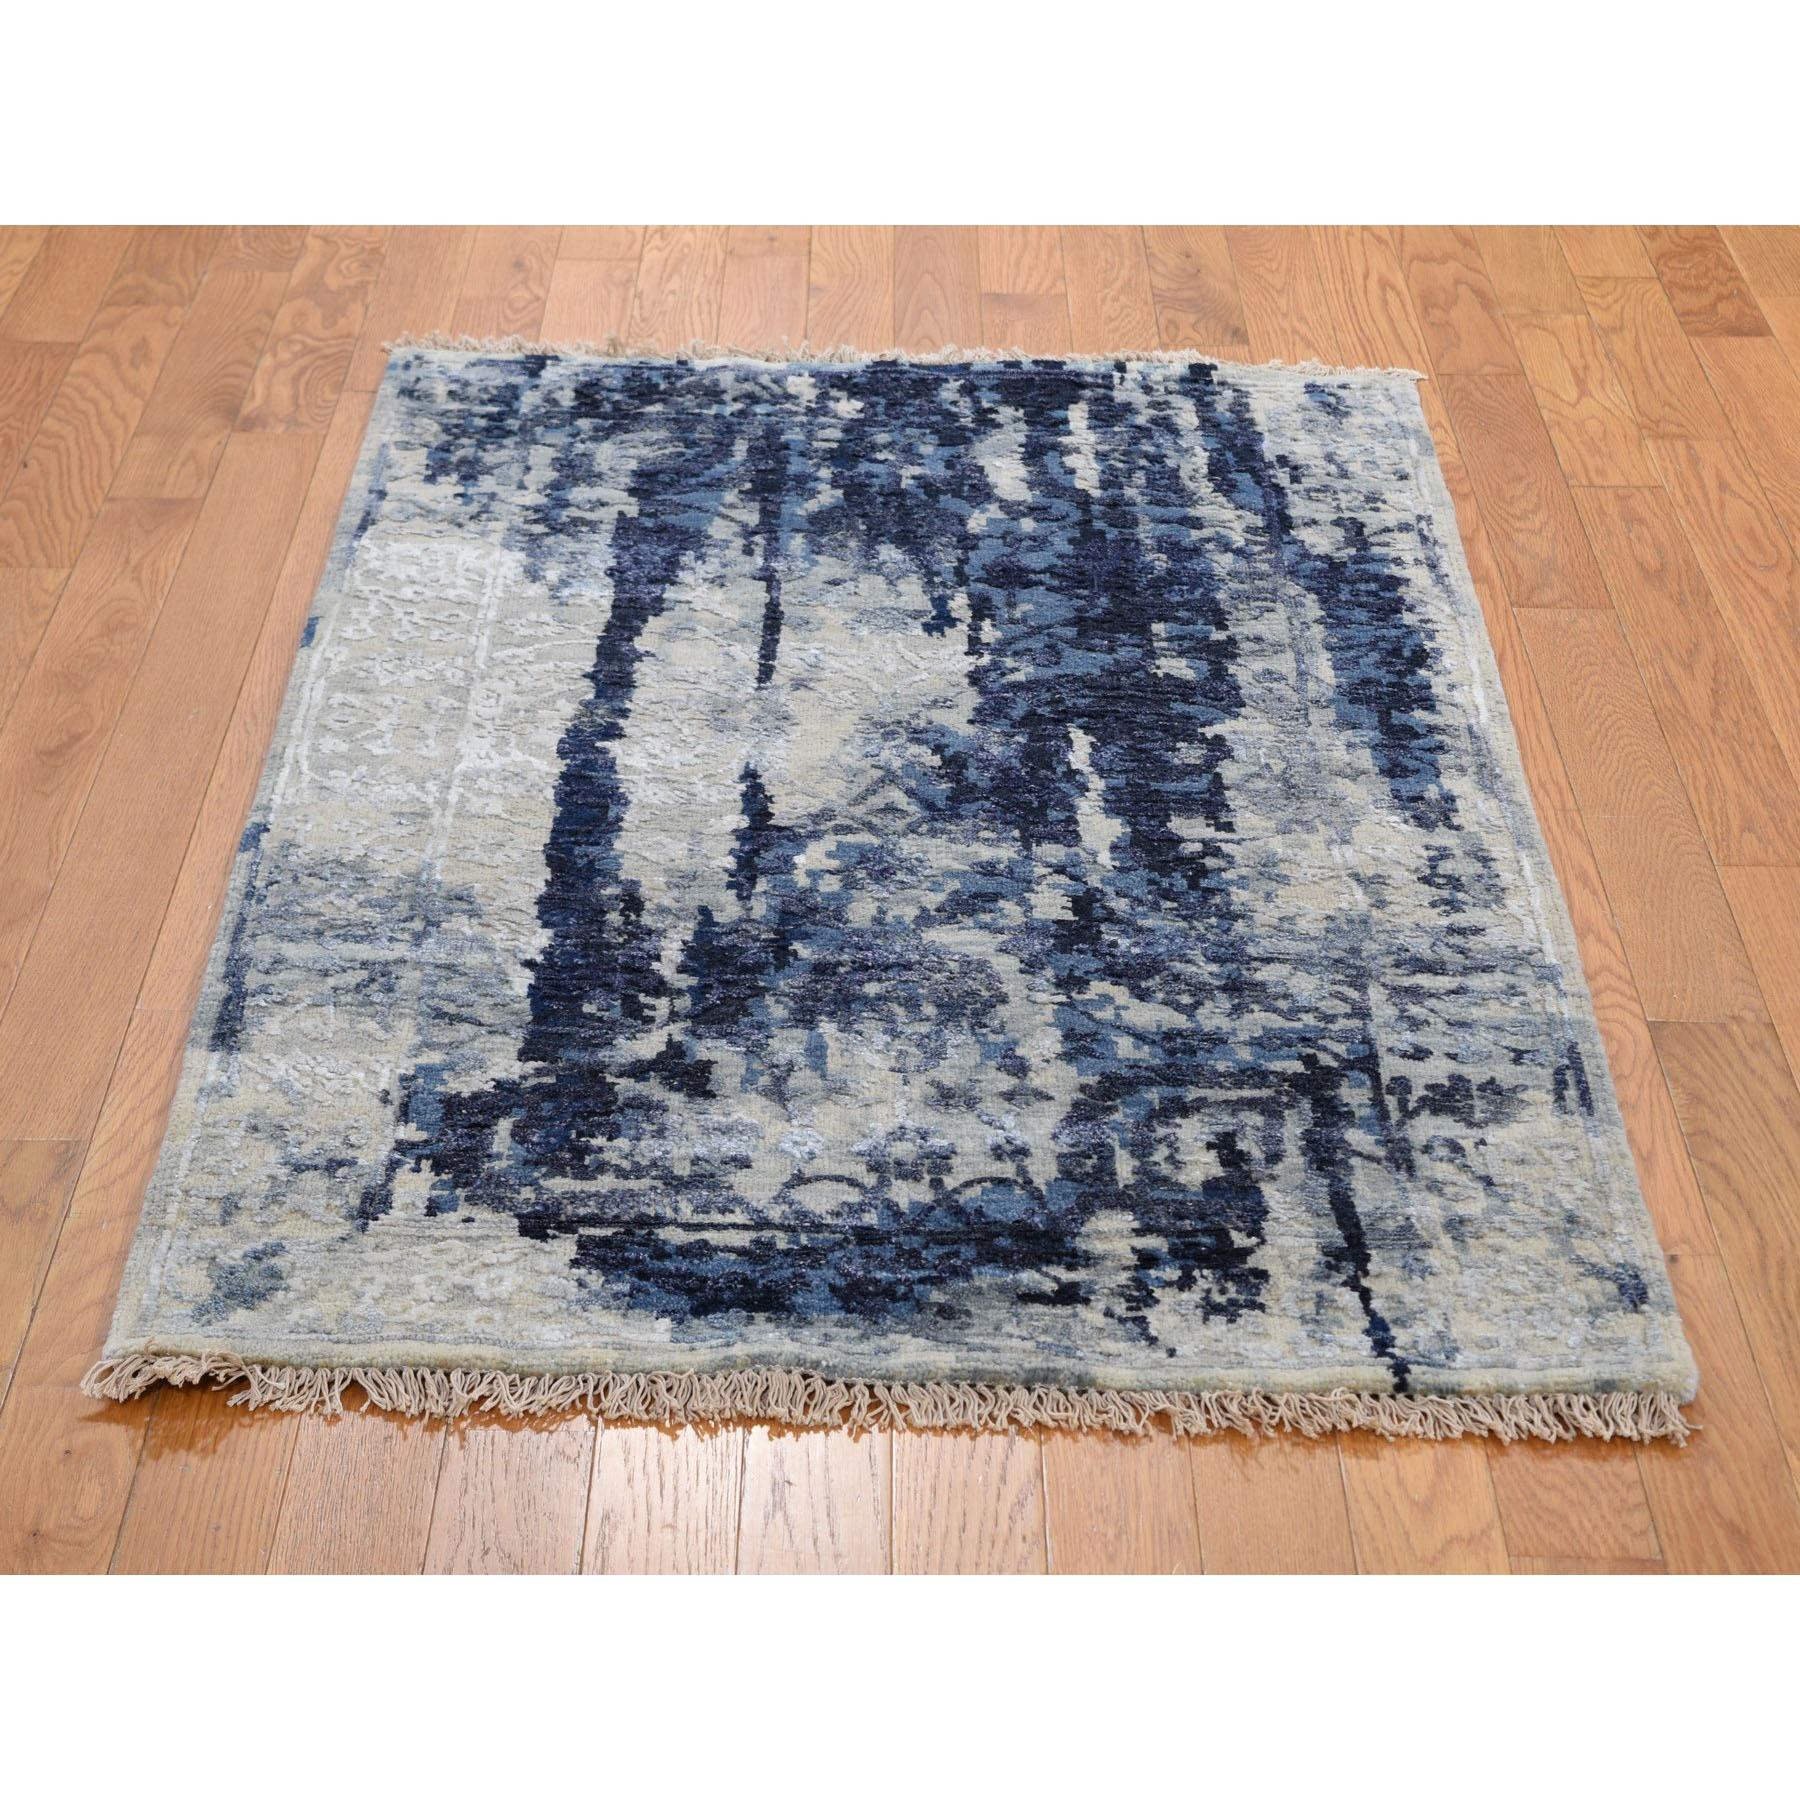 3'x5' Wool And Silk Shibori Design Tone On Tone Hand Knotted Oriental Rug